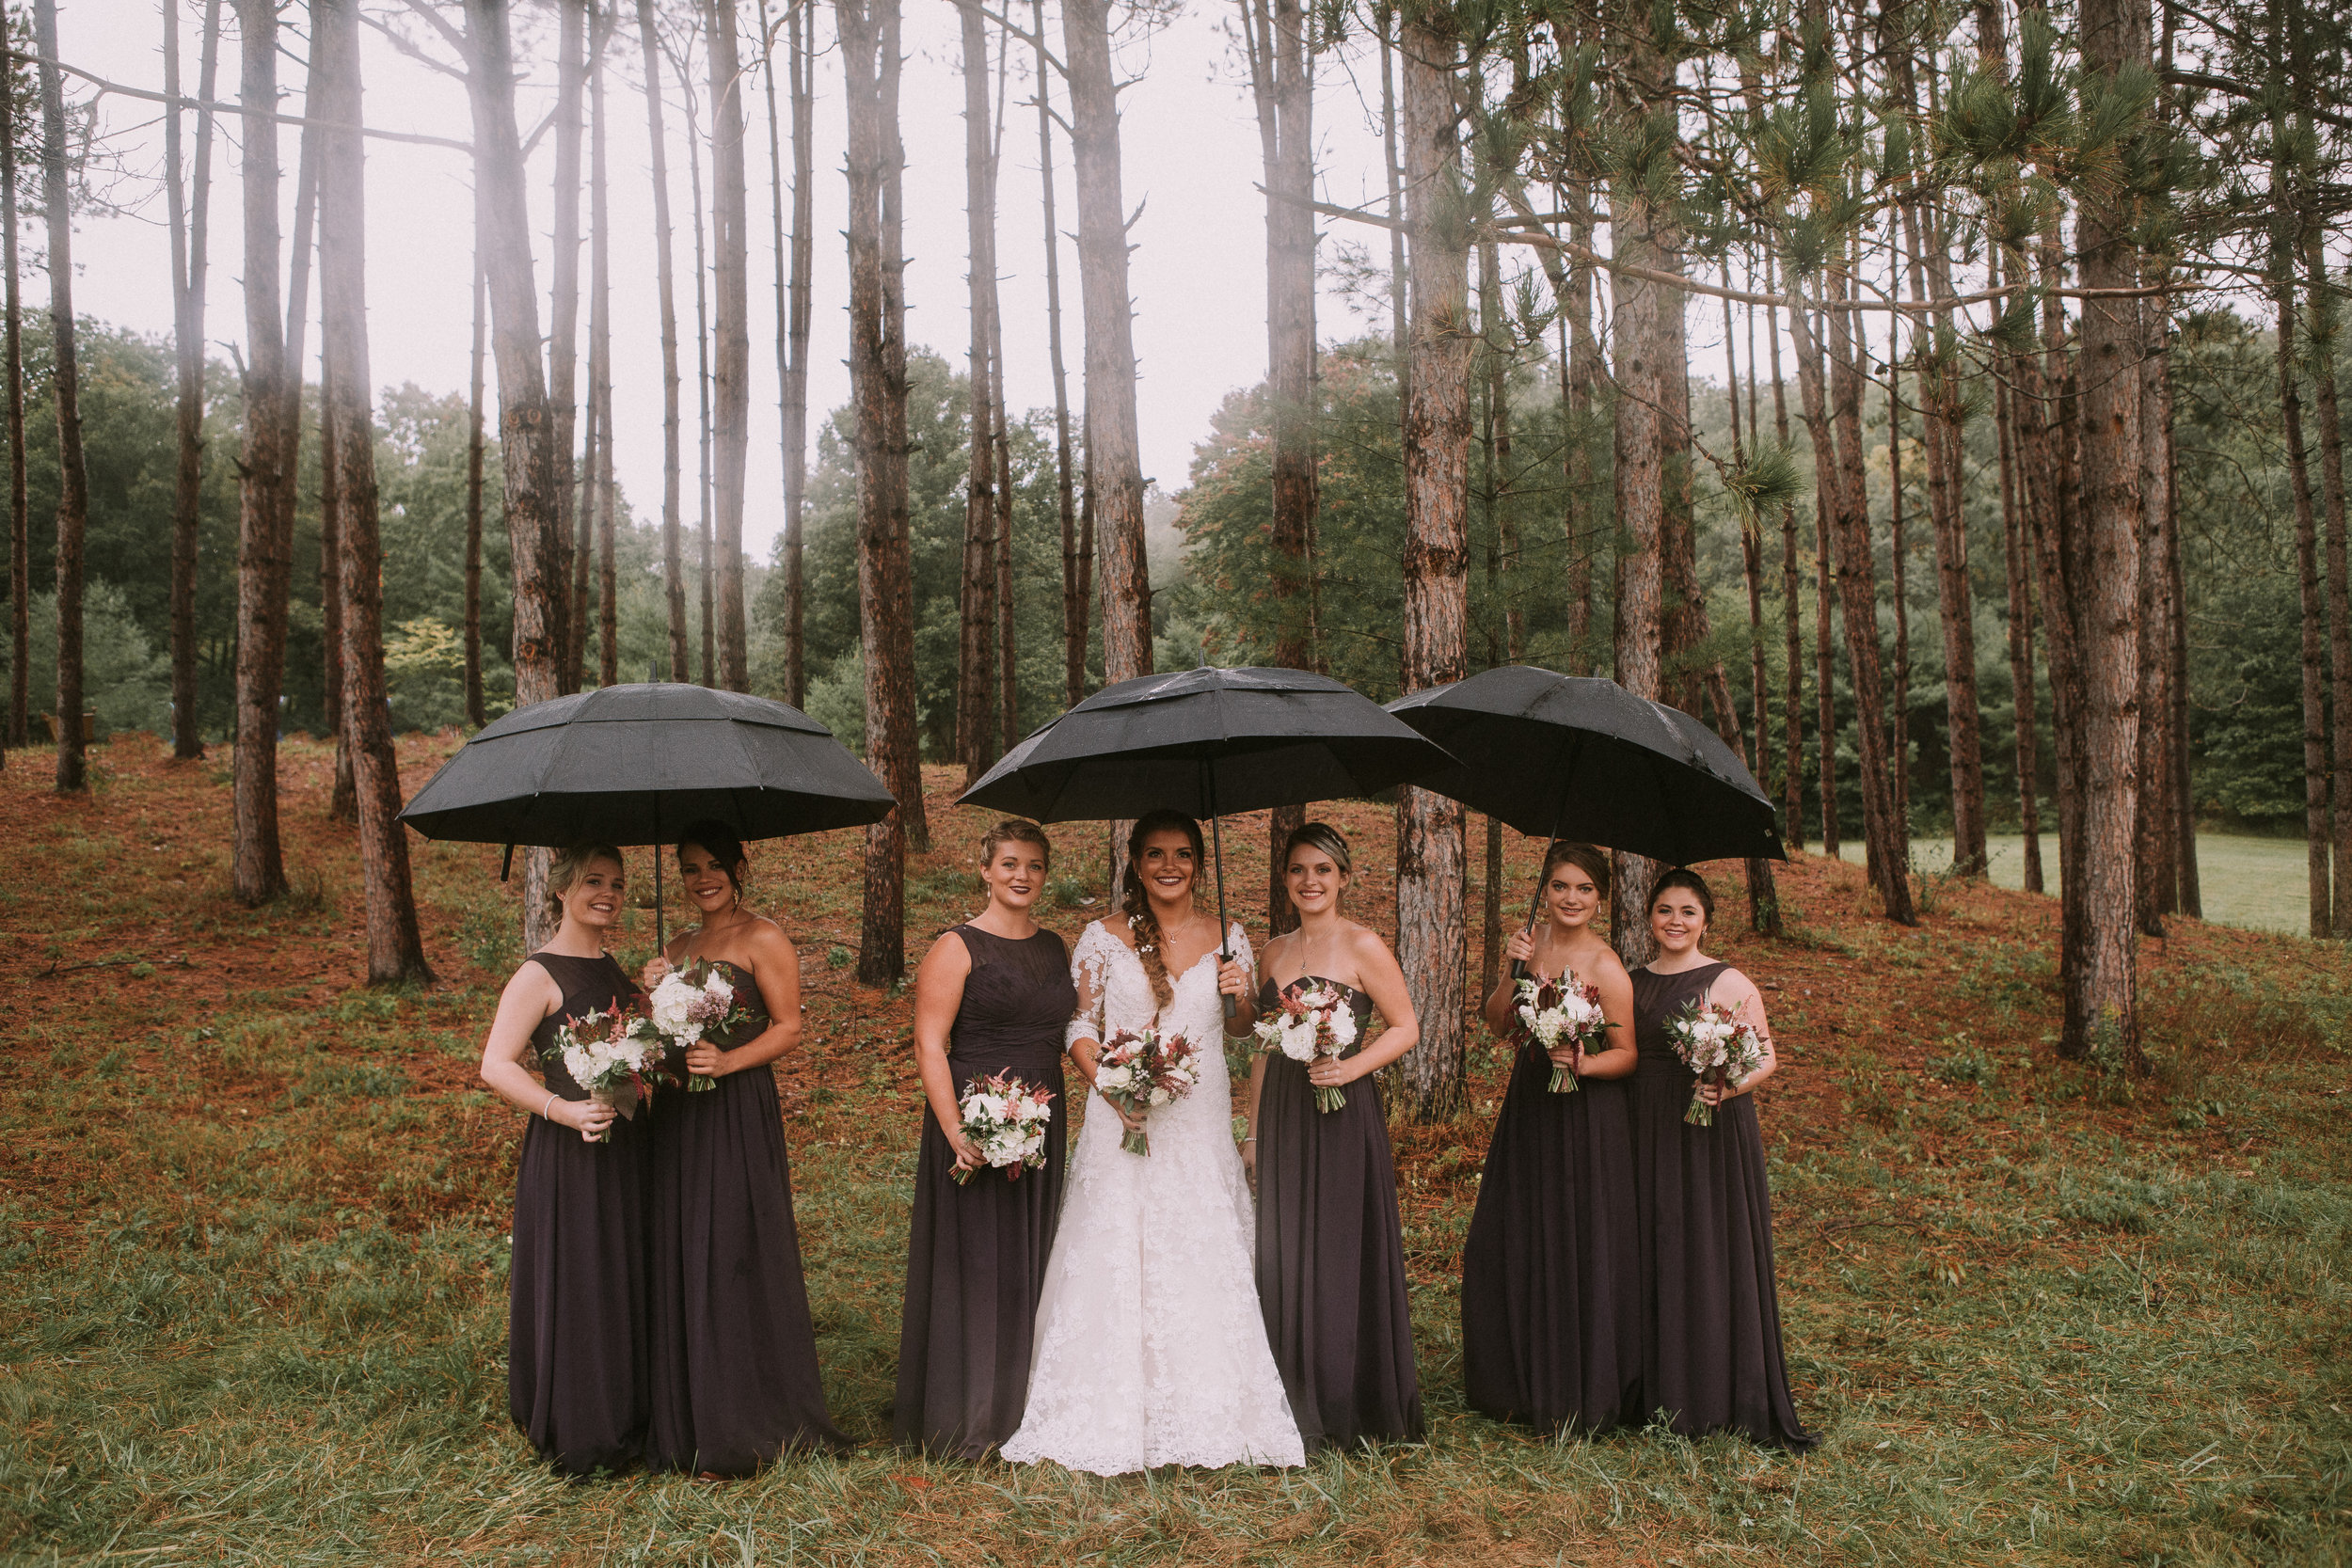 Parker Wedding20161001_0726 copy.jpg